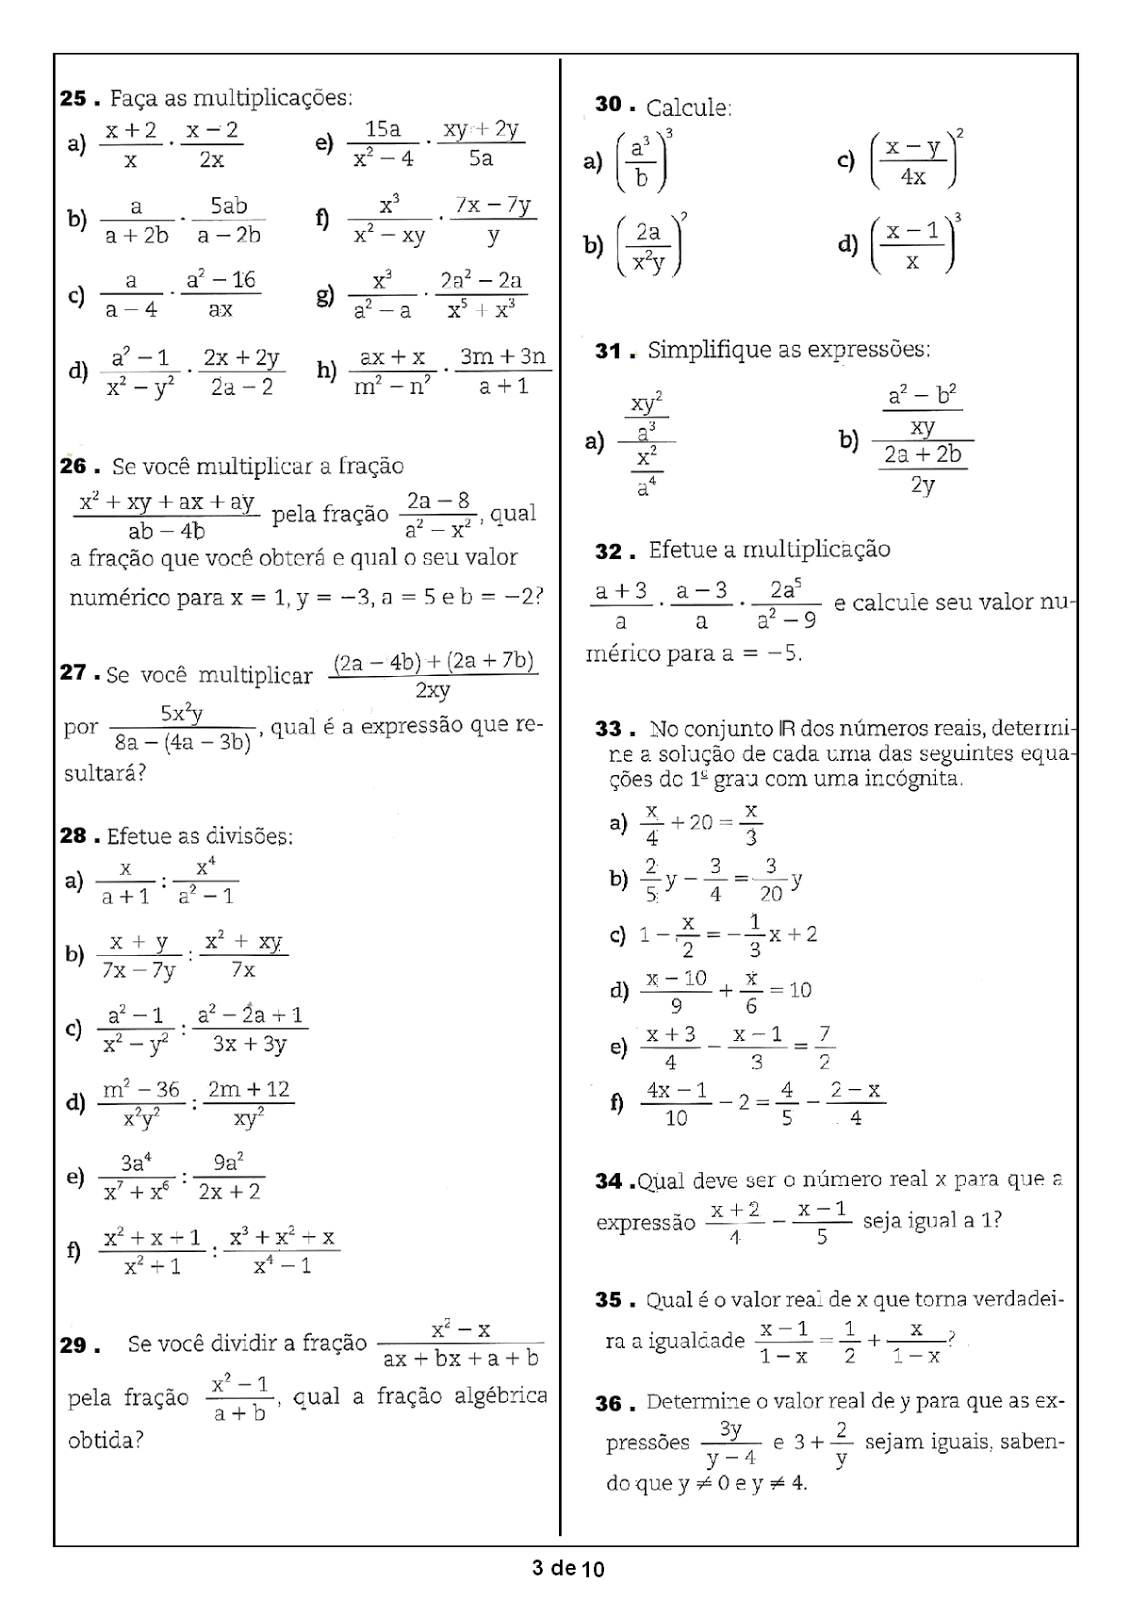 Portal Escola Matematica 8 Ano 190 Atividades Com Gabarito Exercicios Provas Avaliacoes Ii